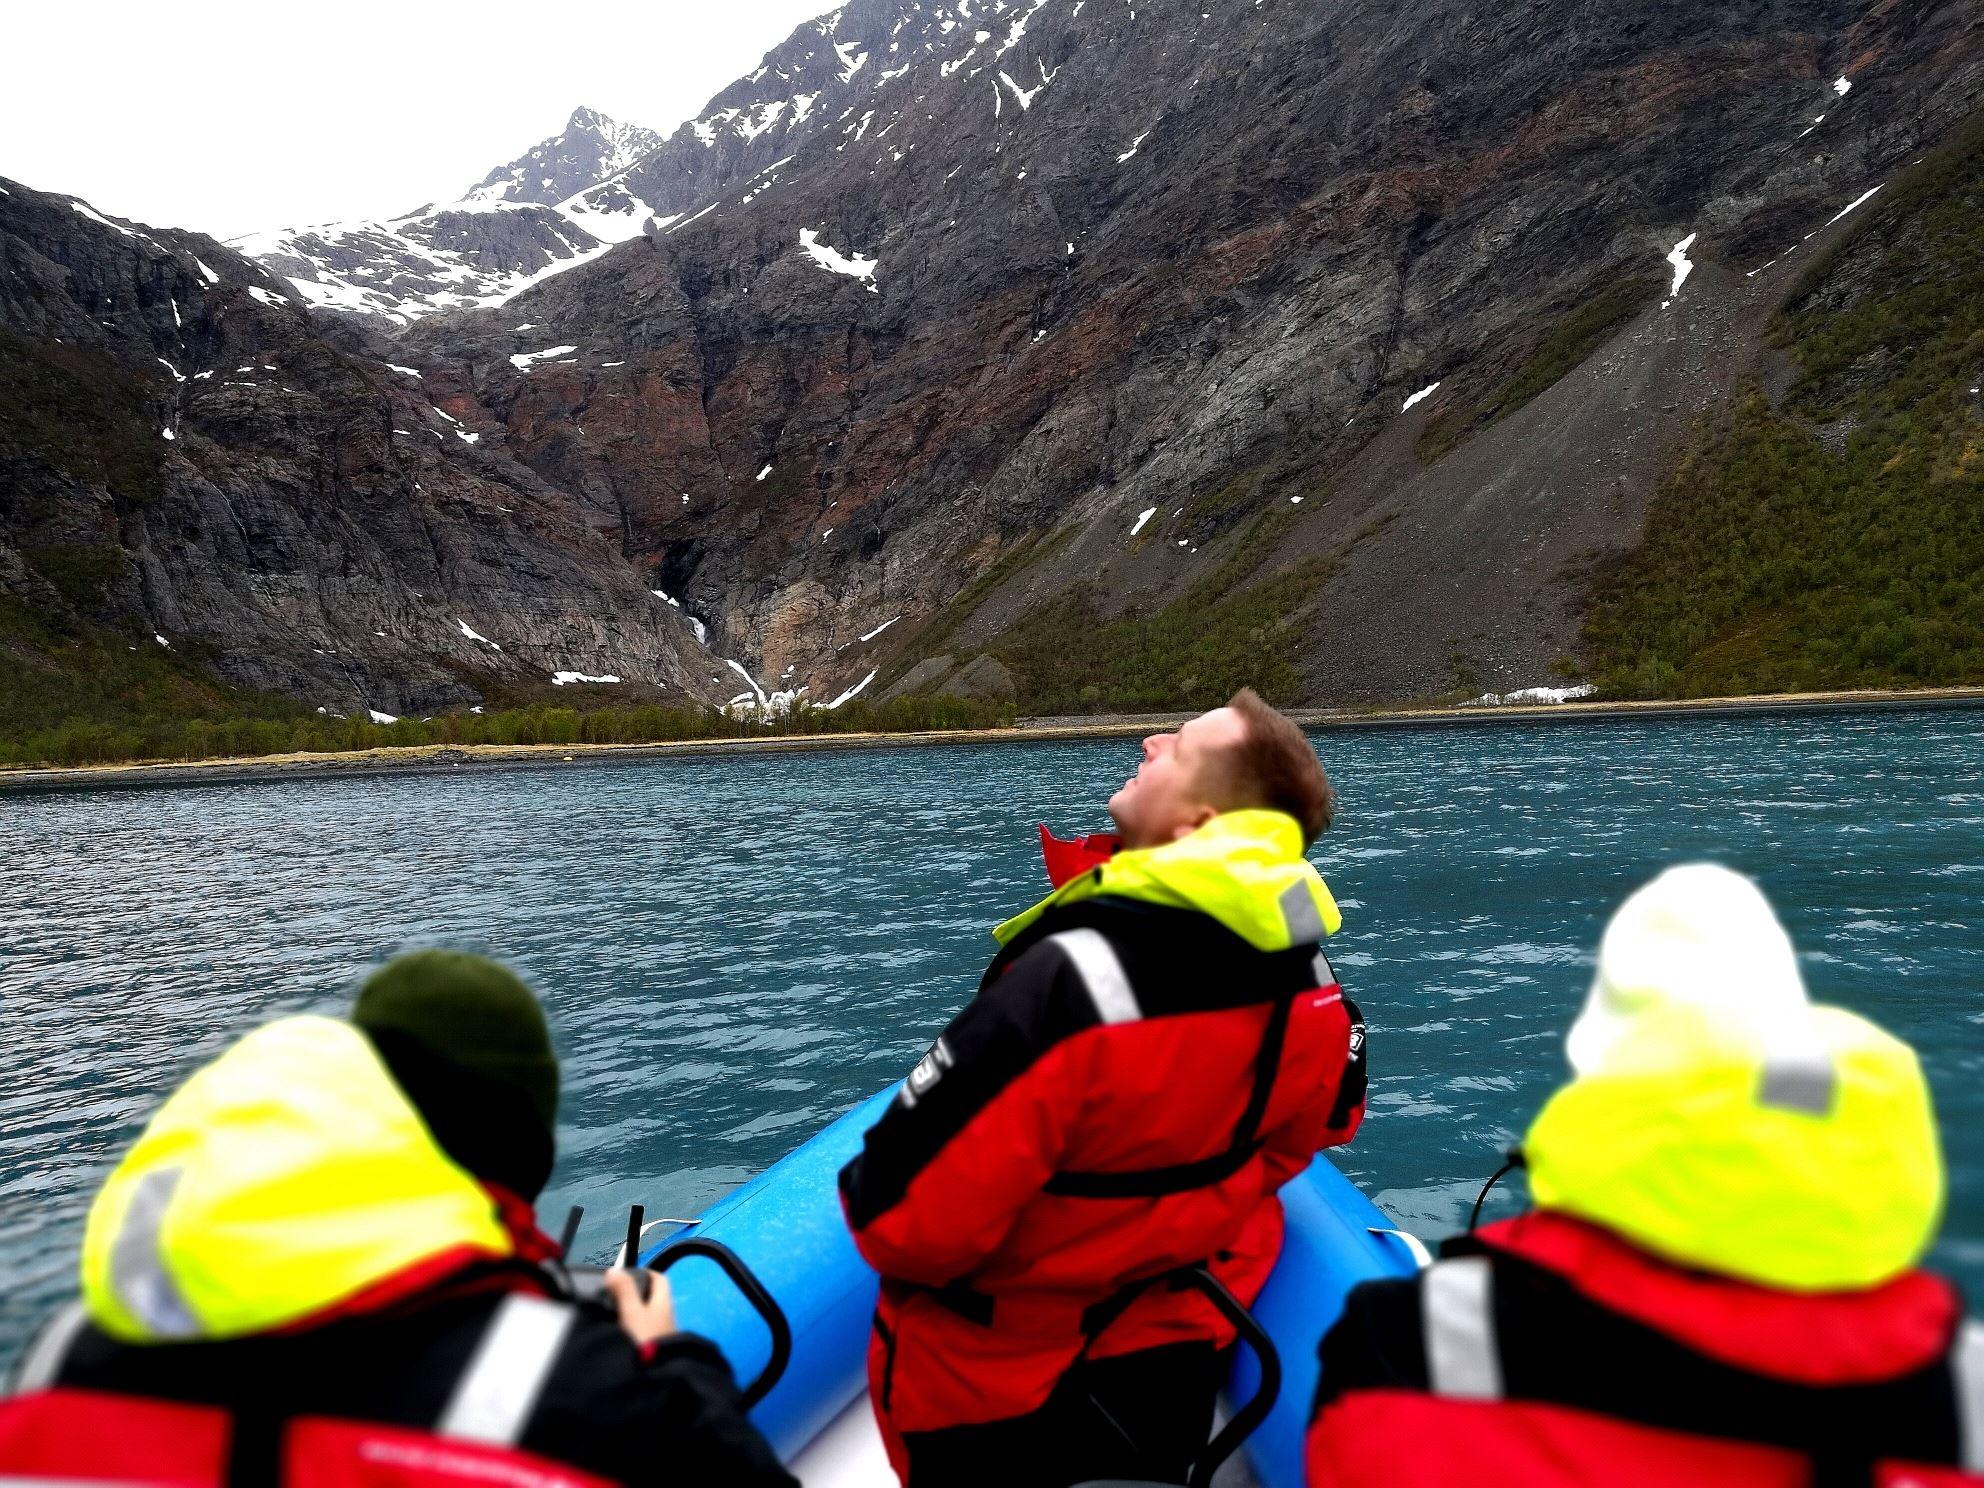 RIB fjord tour - Experience the Lyngenfjord